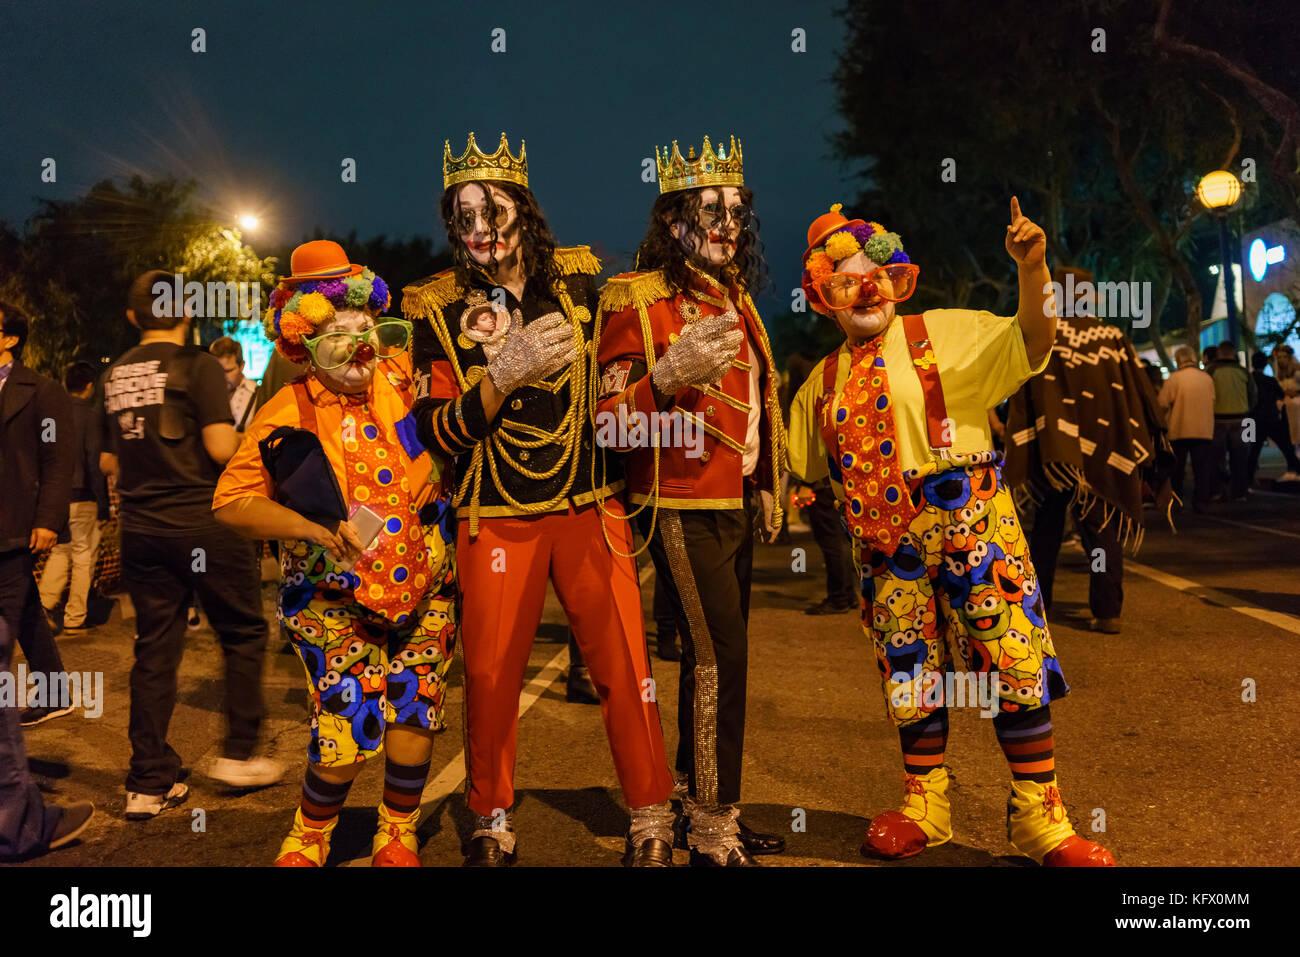 west hollywood halloween carnaval stock photos & west hollywood